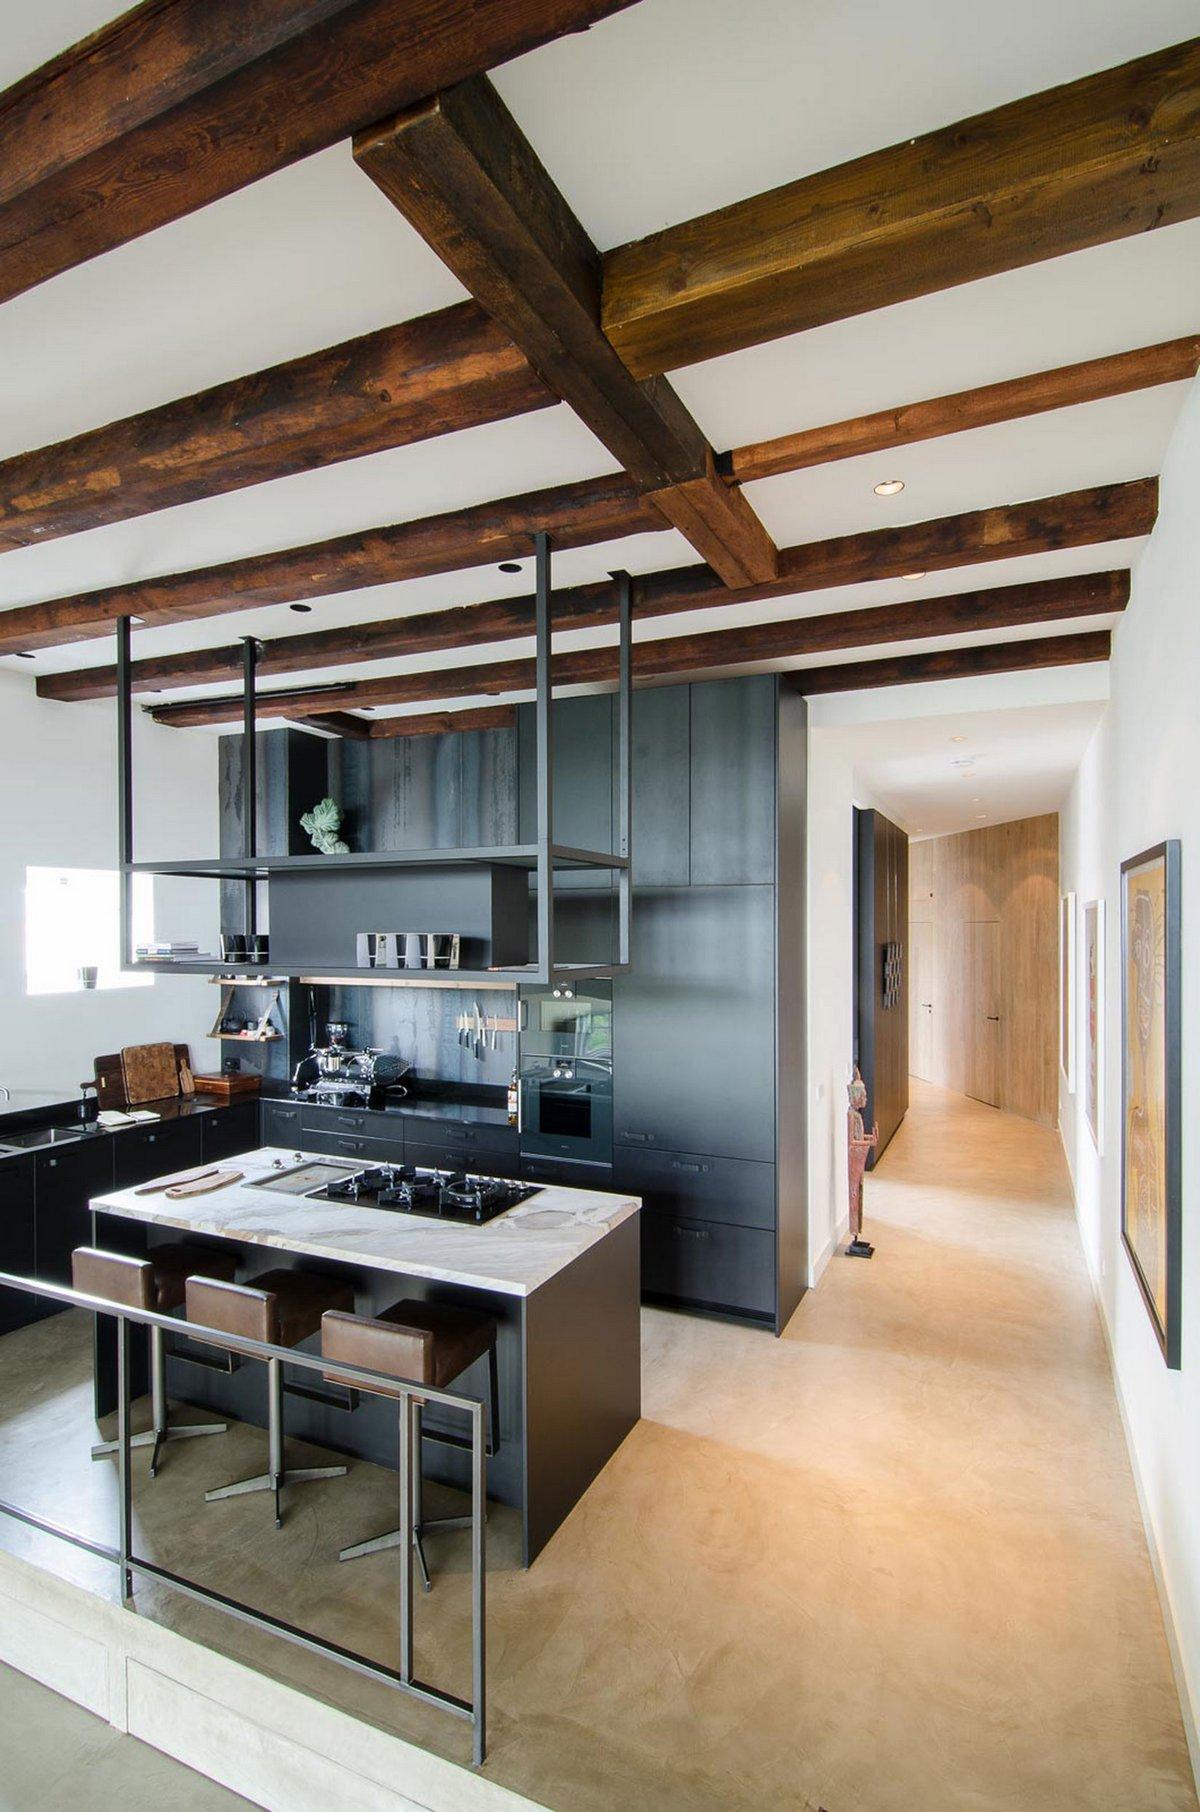 The Bloemgracht Loft, Standard Studio, планировка лофта, планировка частного дома фото, лофты фото, интерьер лофта фото, частный дом в Амстердам фото